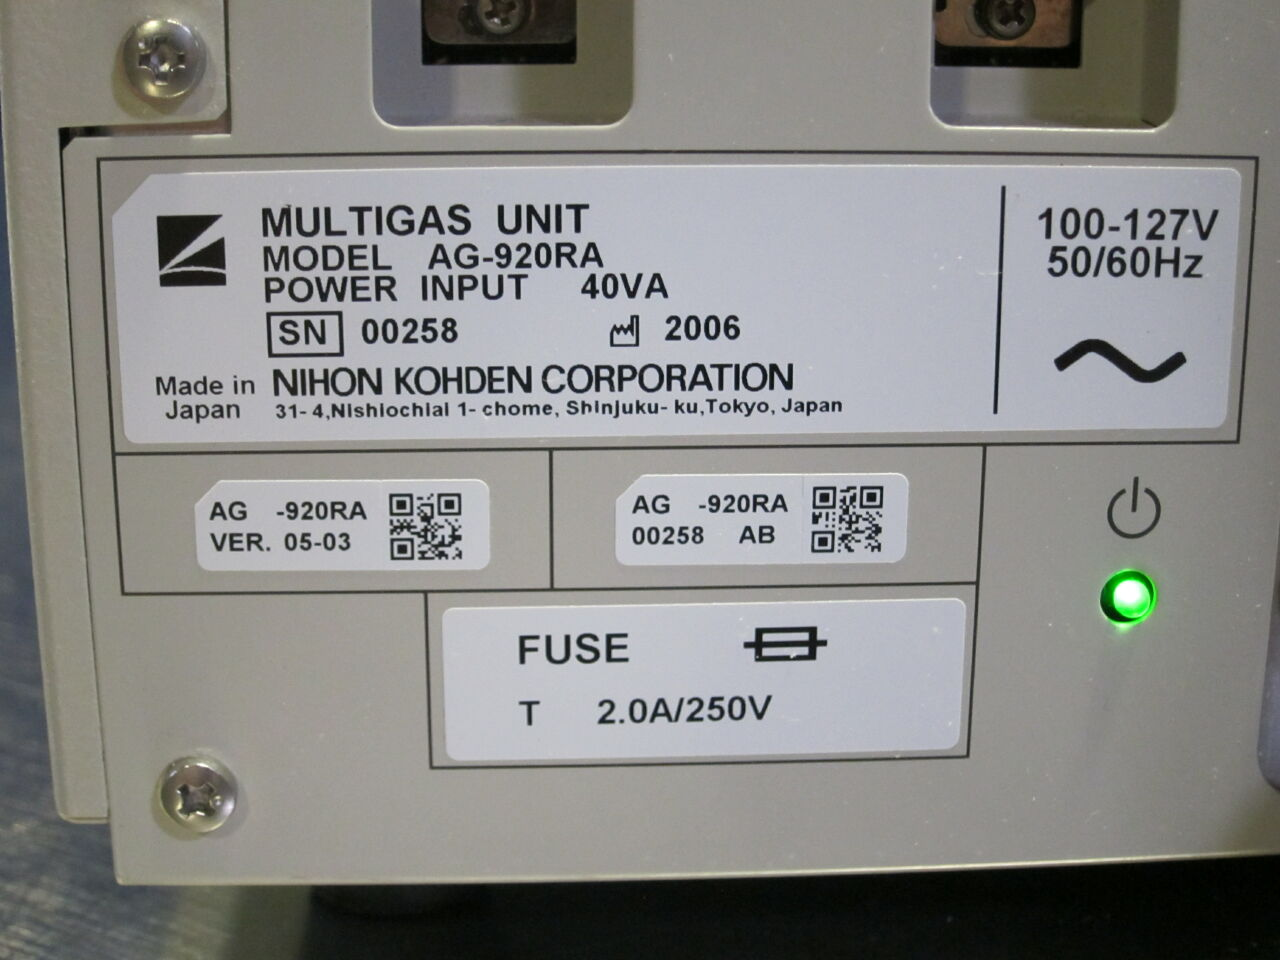 NIHON KOHDEN AG-920RA Multigas Unit